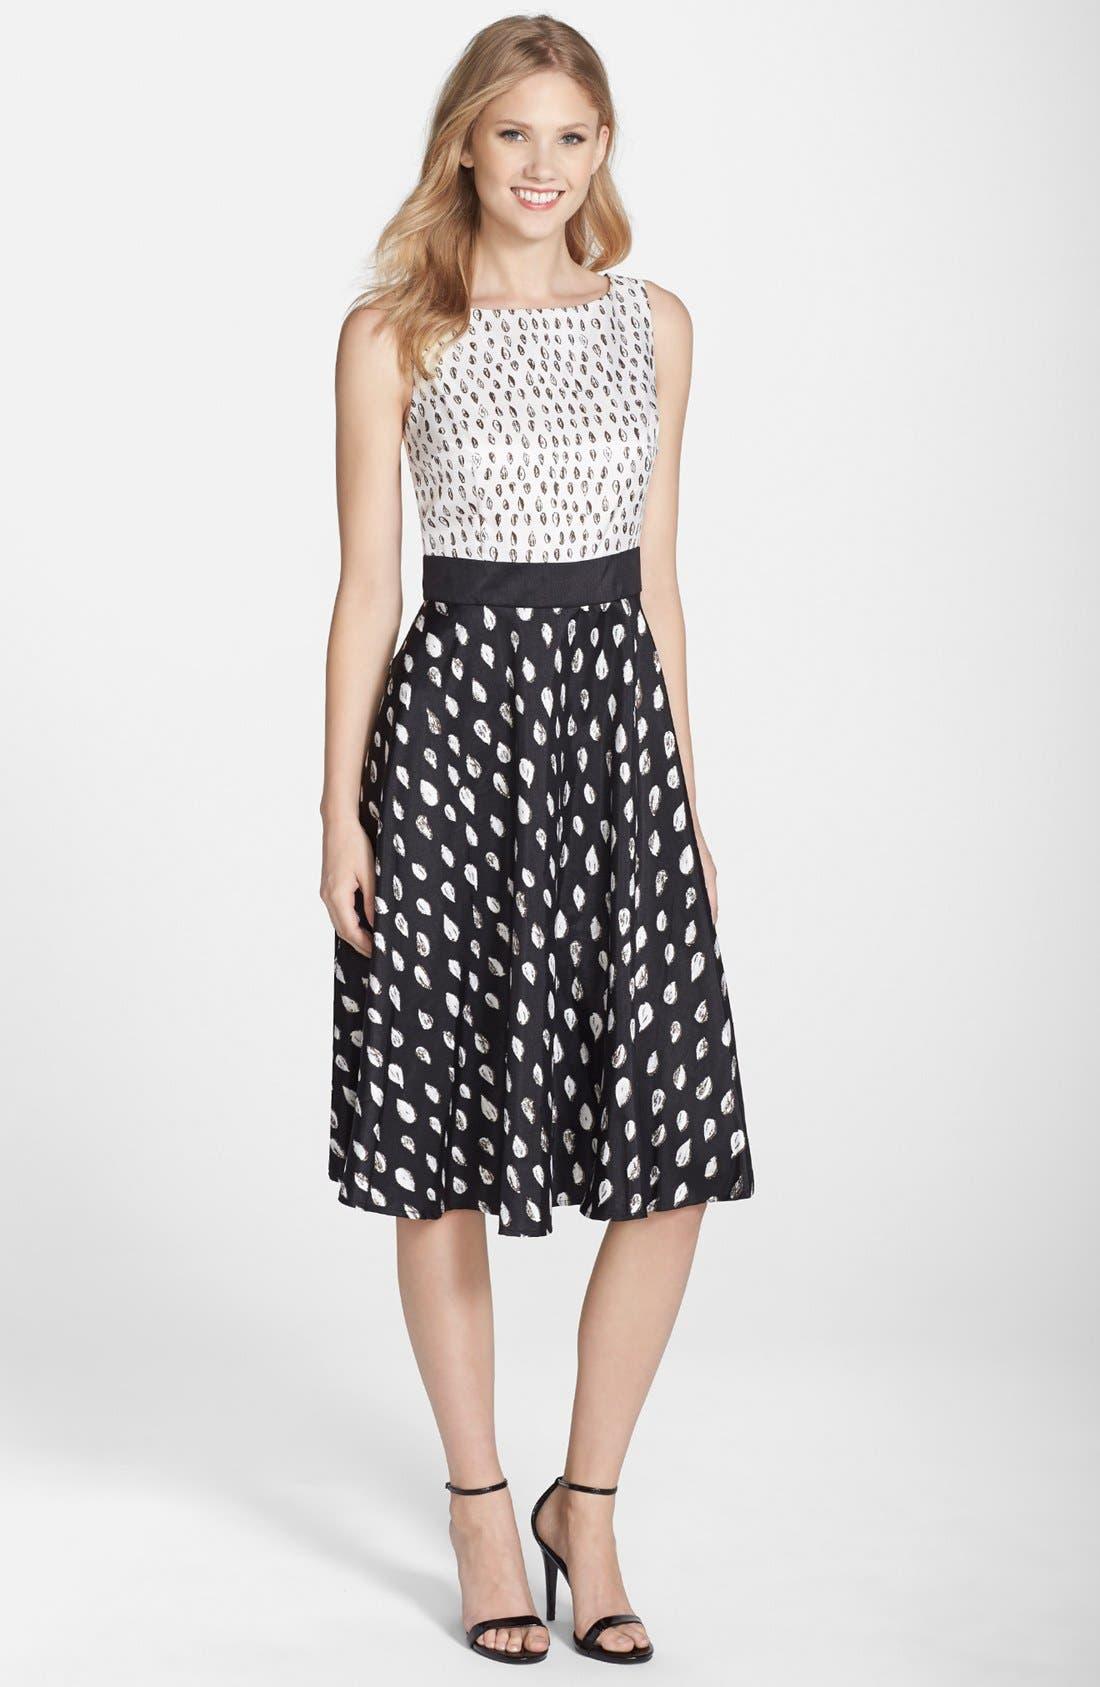 Alternate Image 1 Selected - Gabby Skye Print Shantung Fit & Flare Dress